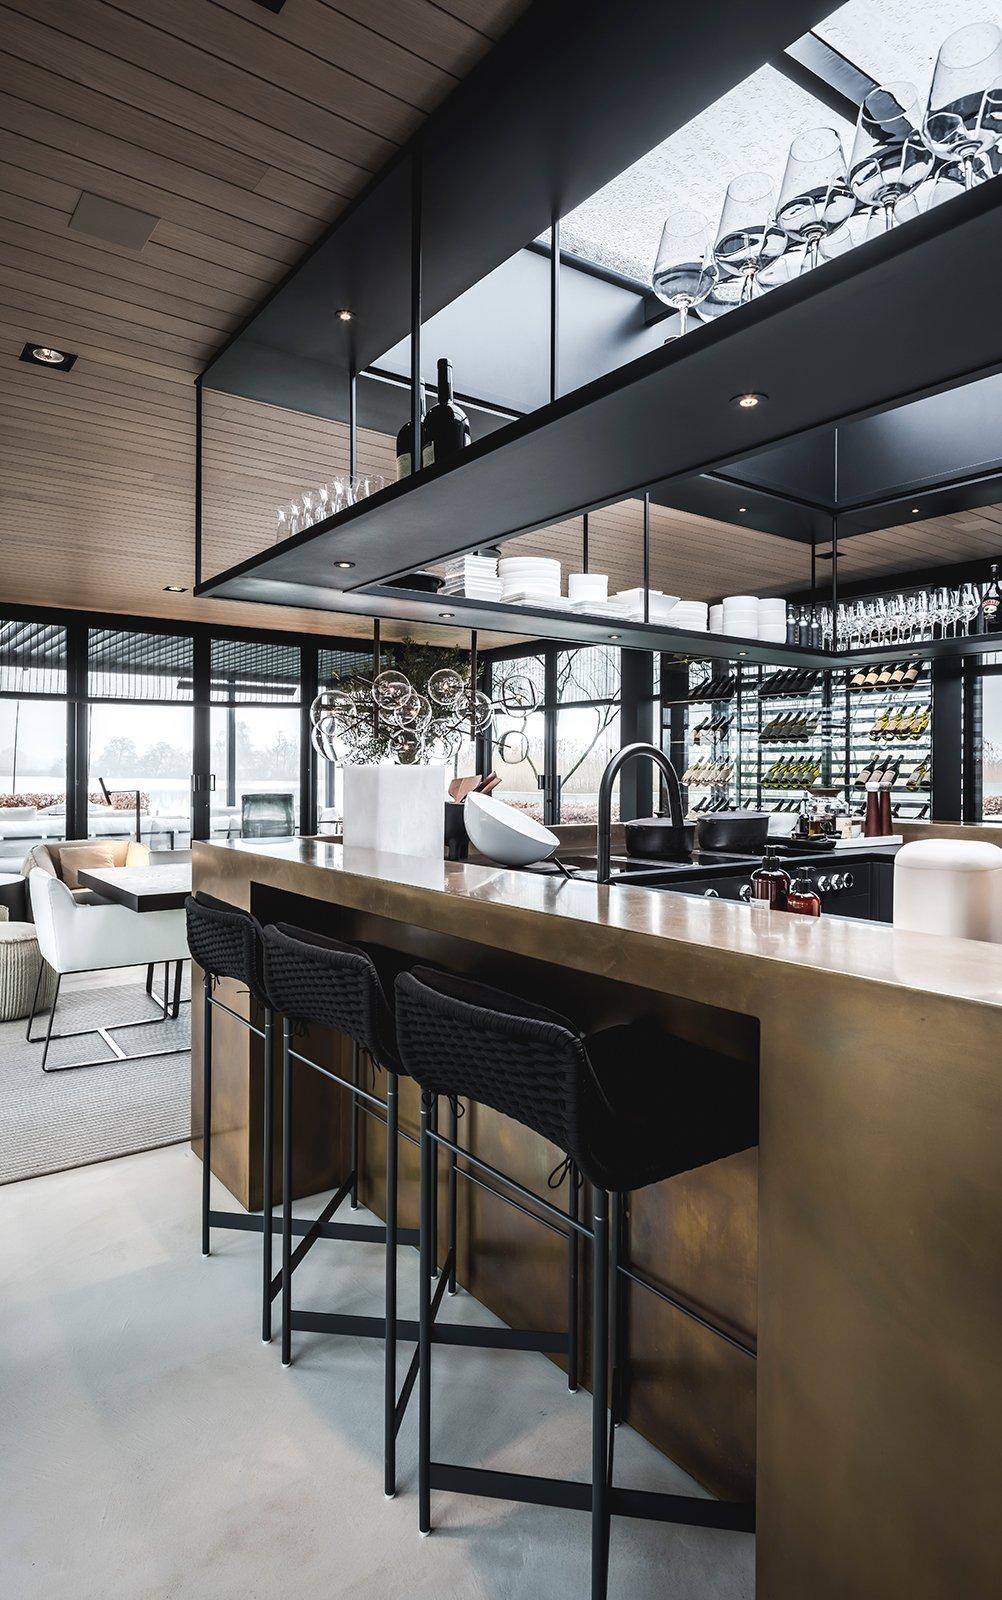 culimaat, Marcel Wolterinck, luxe keuken